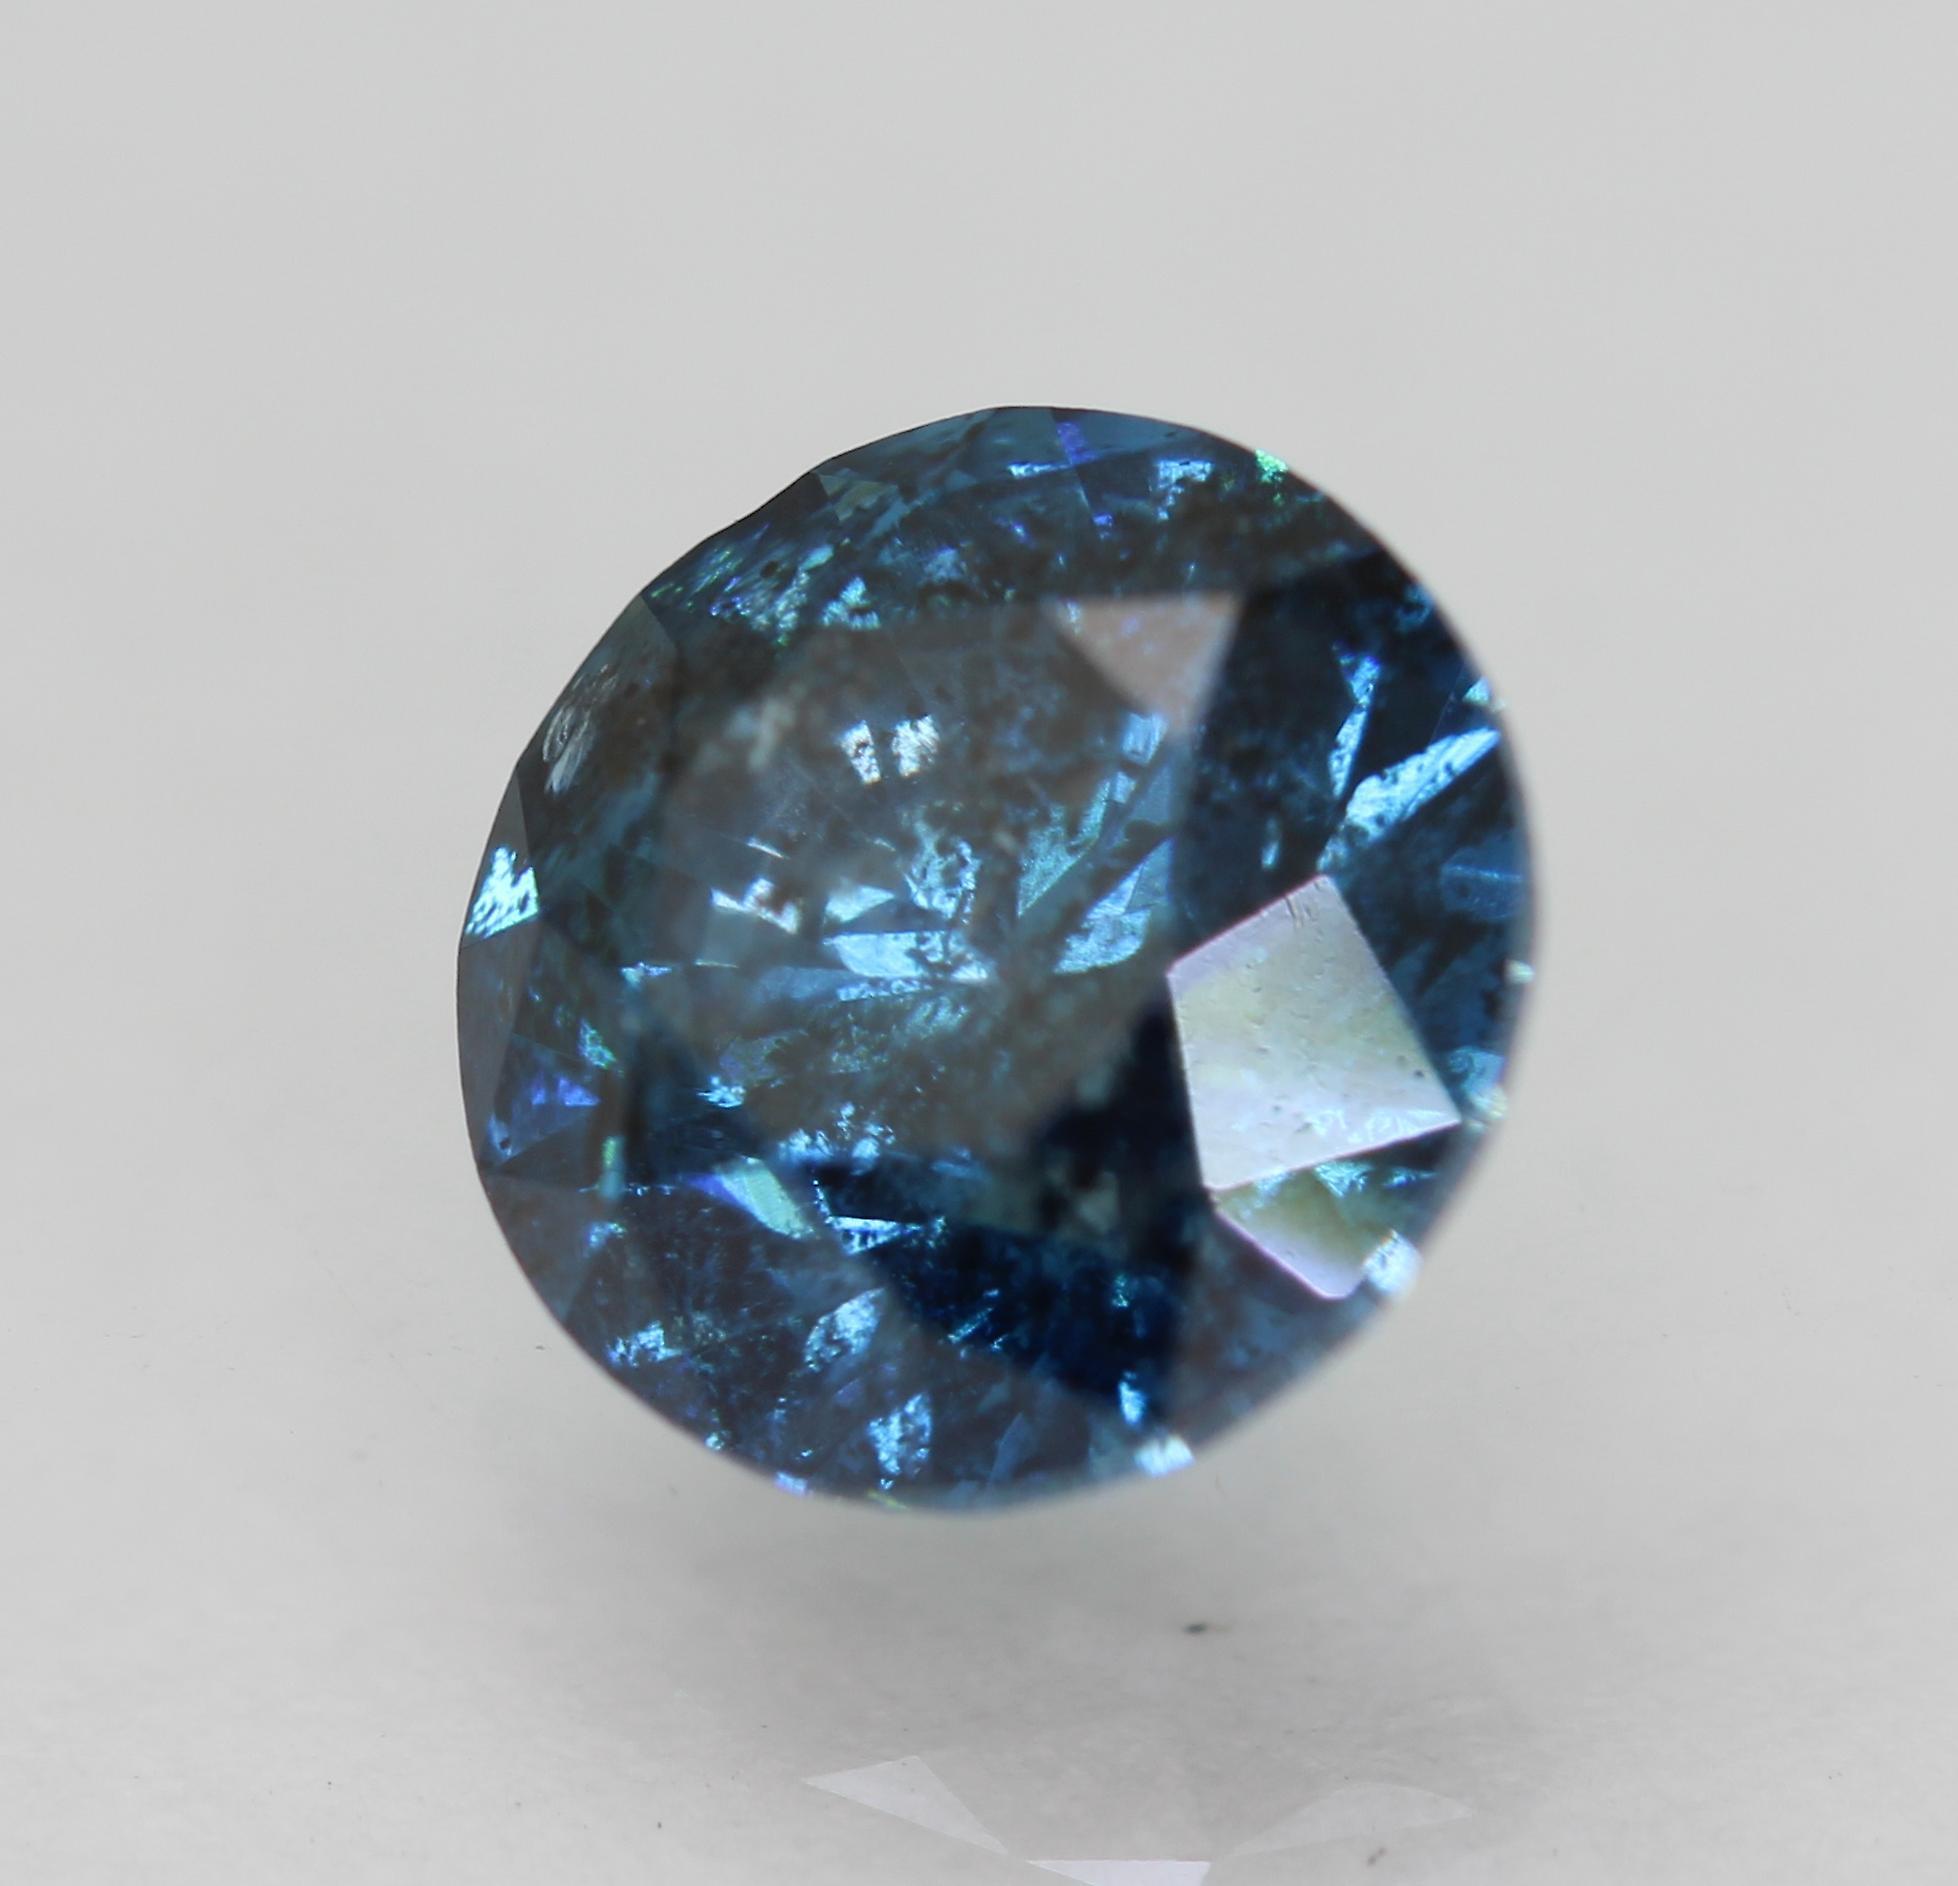 Cert 1.60 Carat Vivid Blue SI2 Round Brilliant Enhanced Natural Diamond 7.26mm